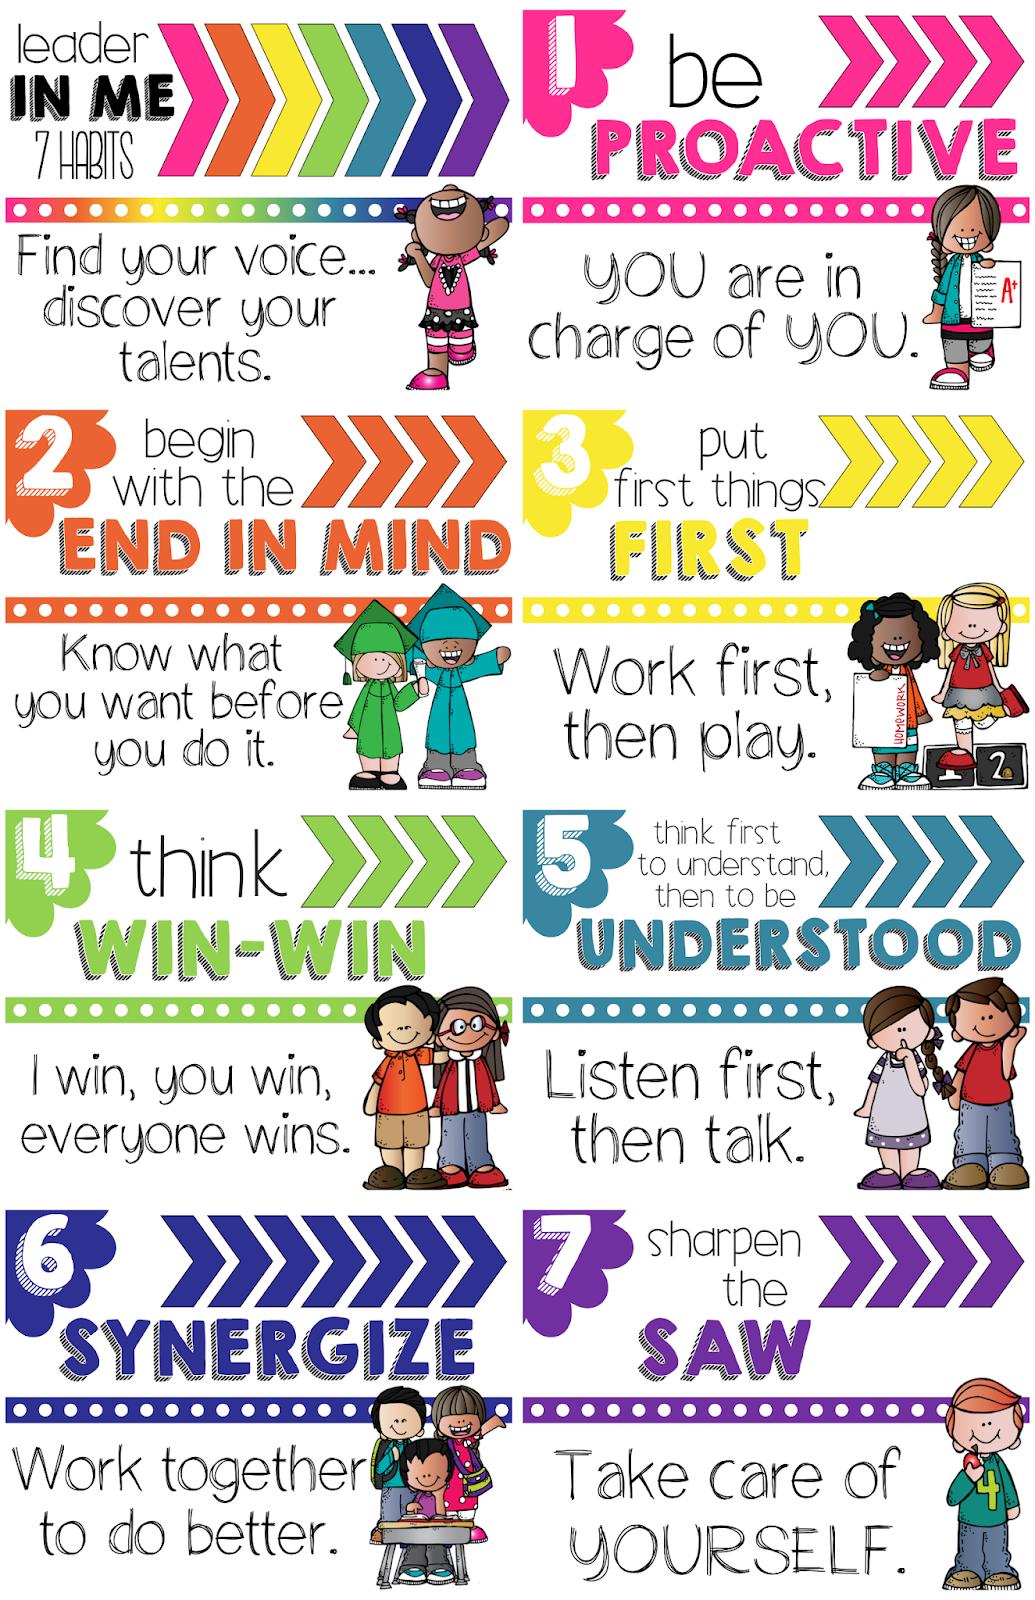 Kearson S Classroom Leader In Me 7 Habits Classroom Posters